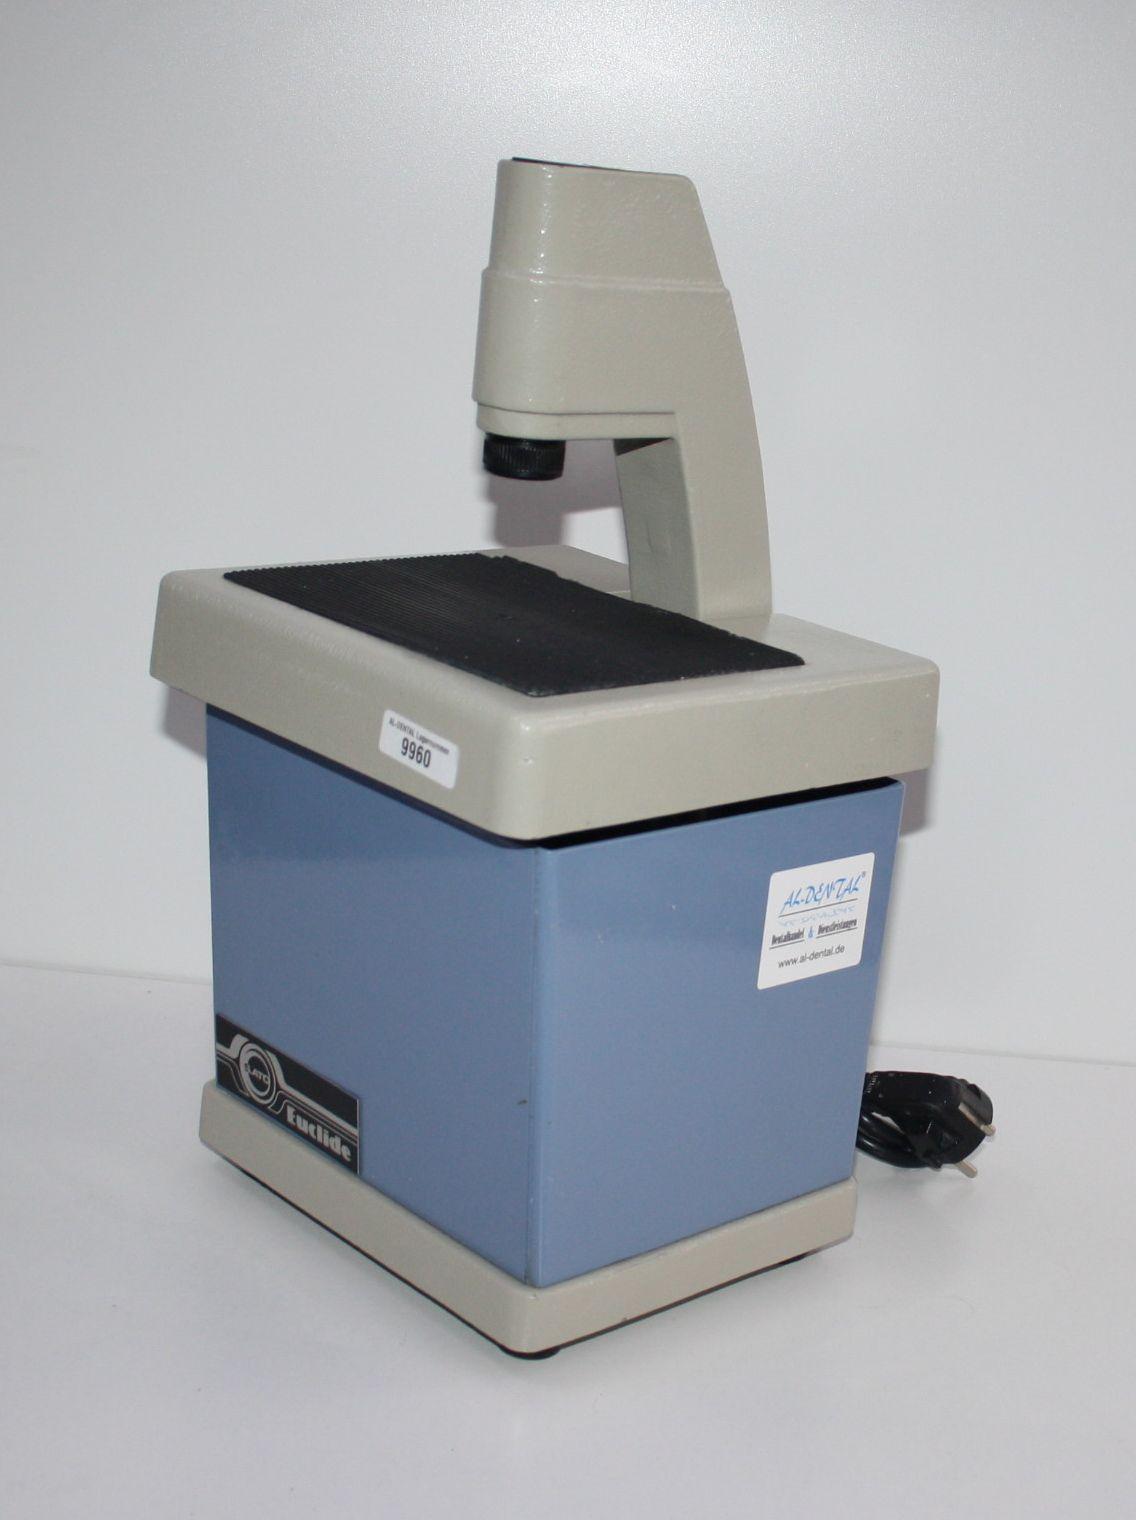 SATO Euclide Laserpinbohrgerät # 9960